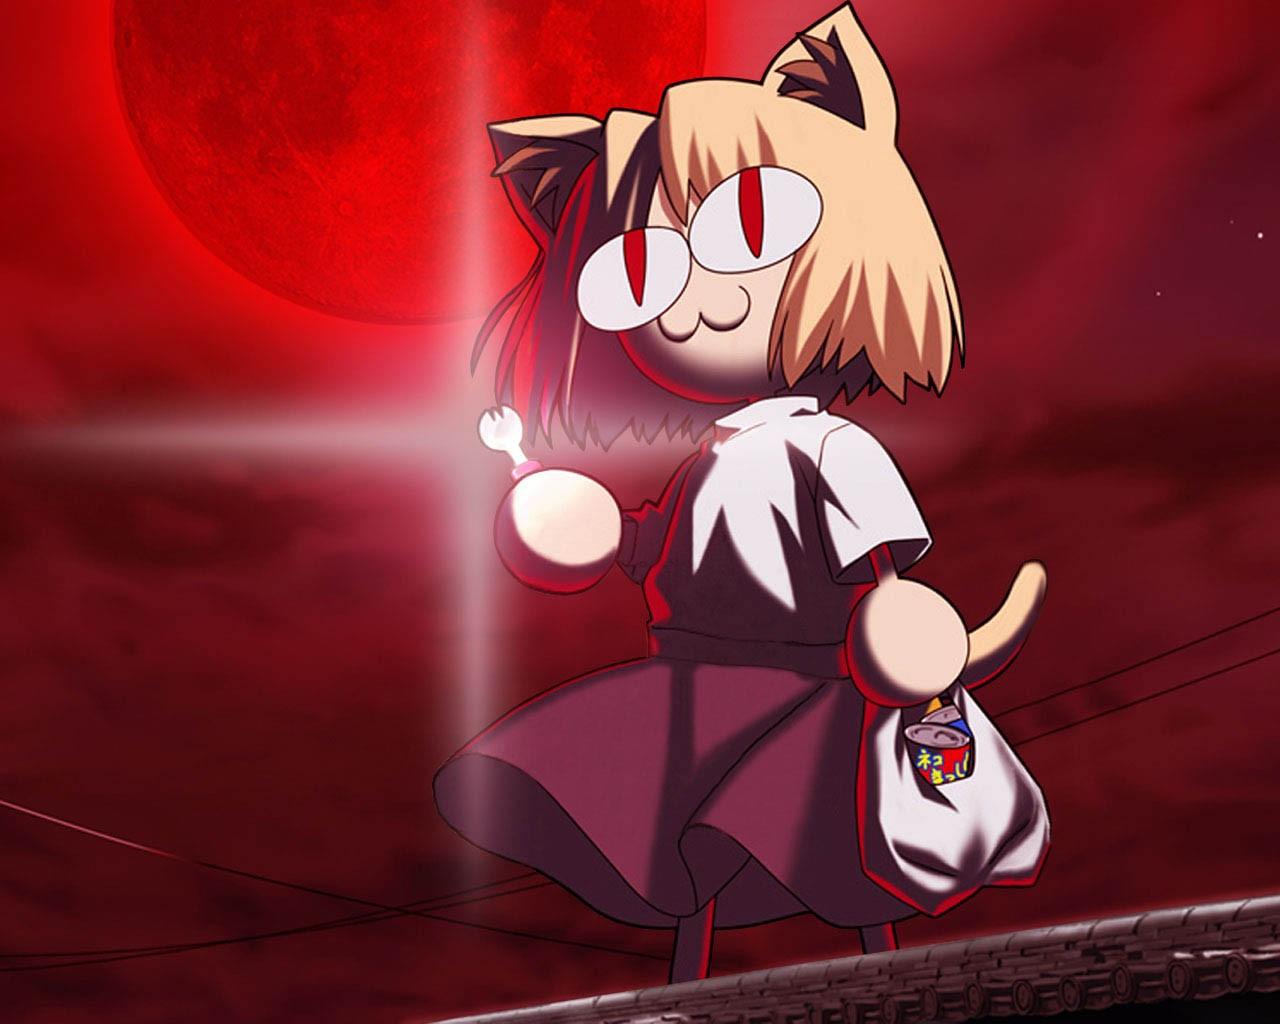 Je le veux Mad in NS ! Bwahaha~ Neko-arc